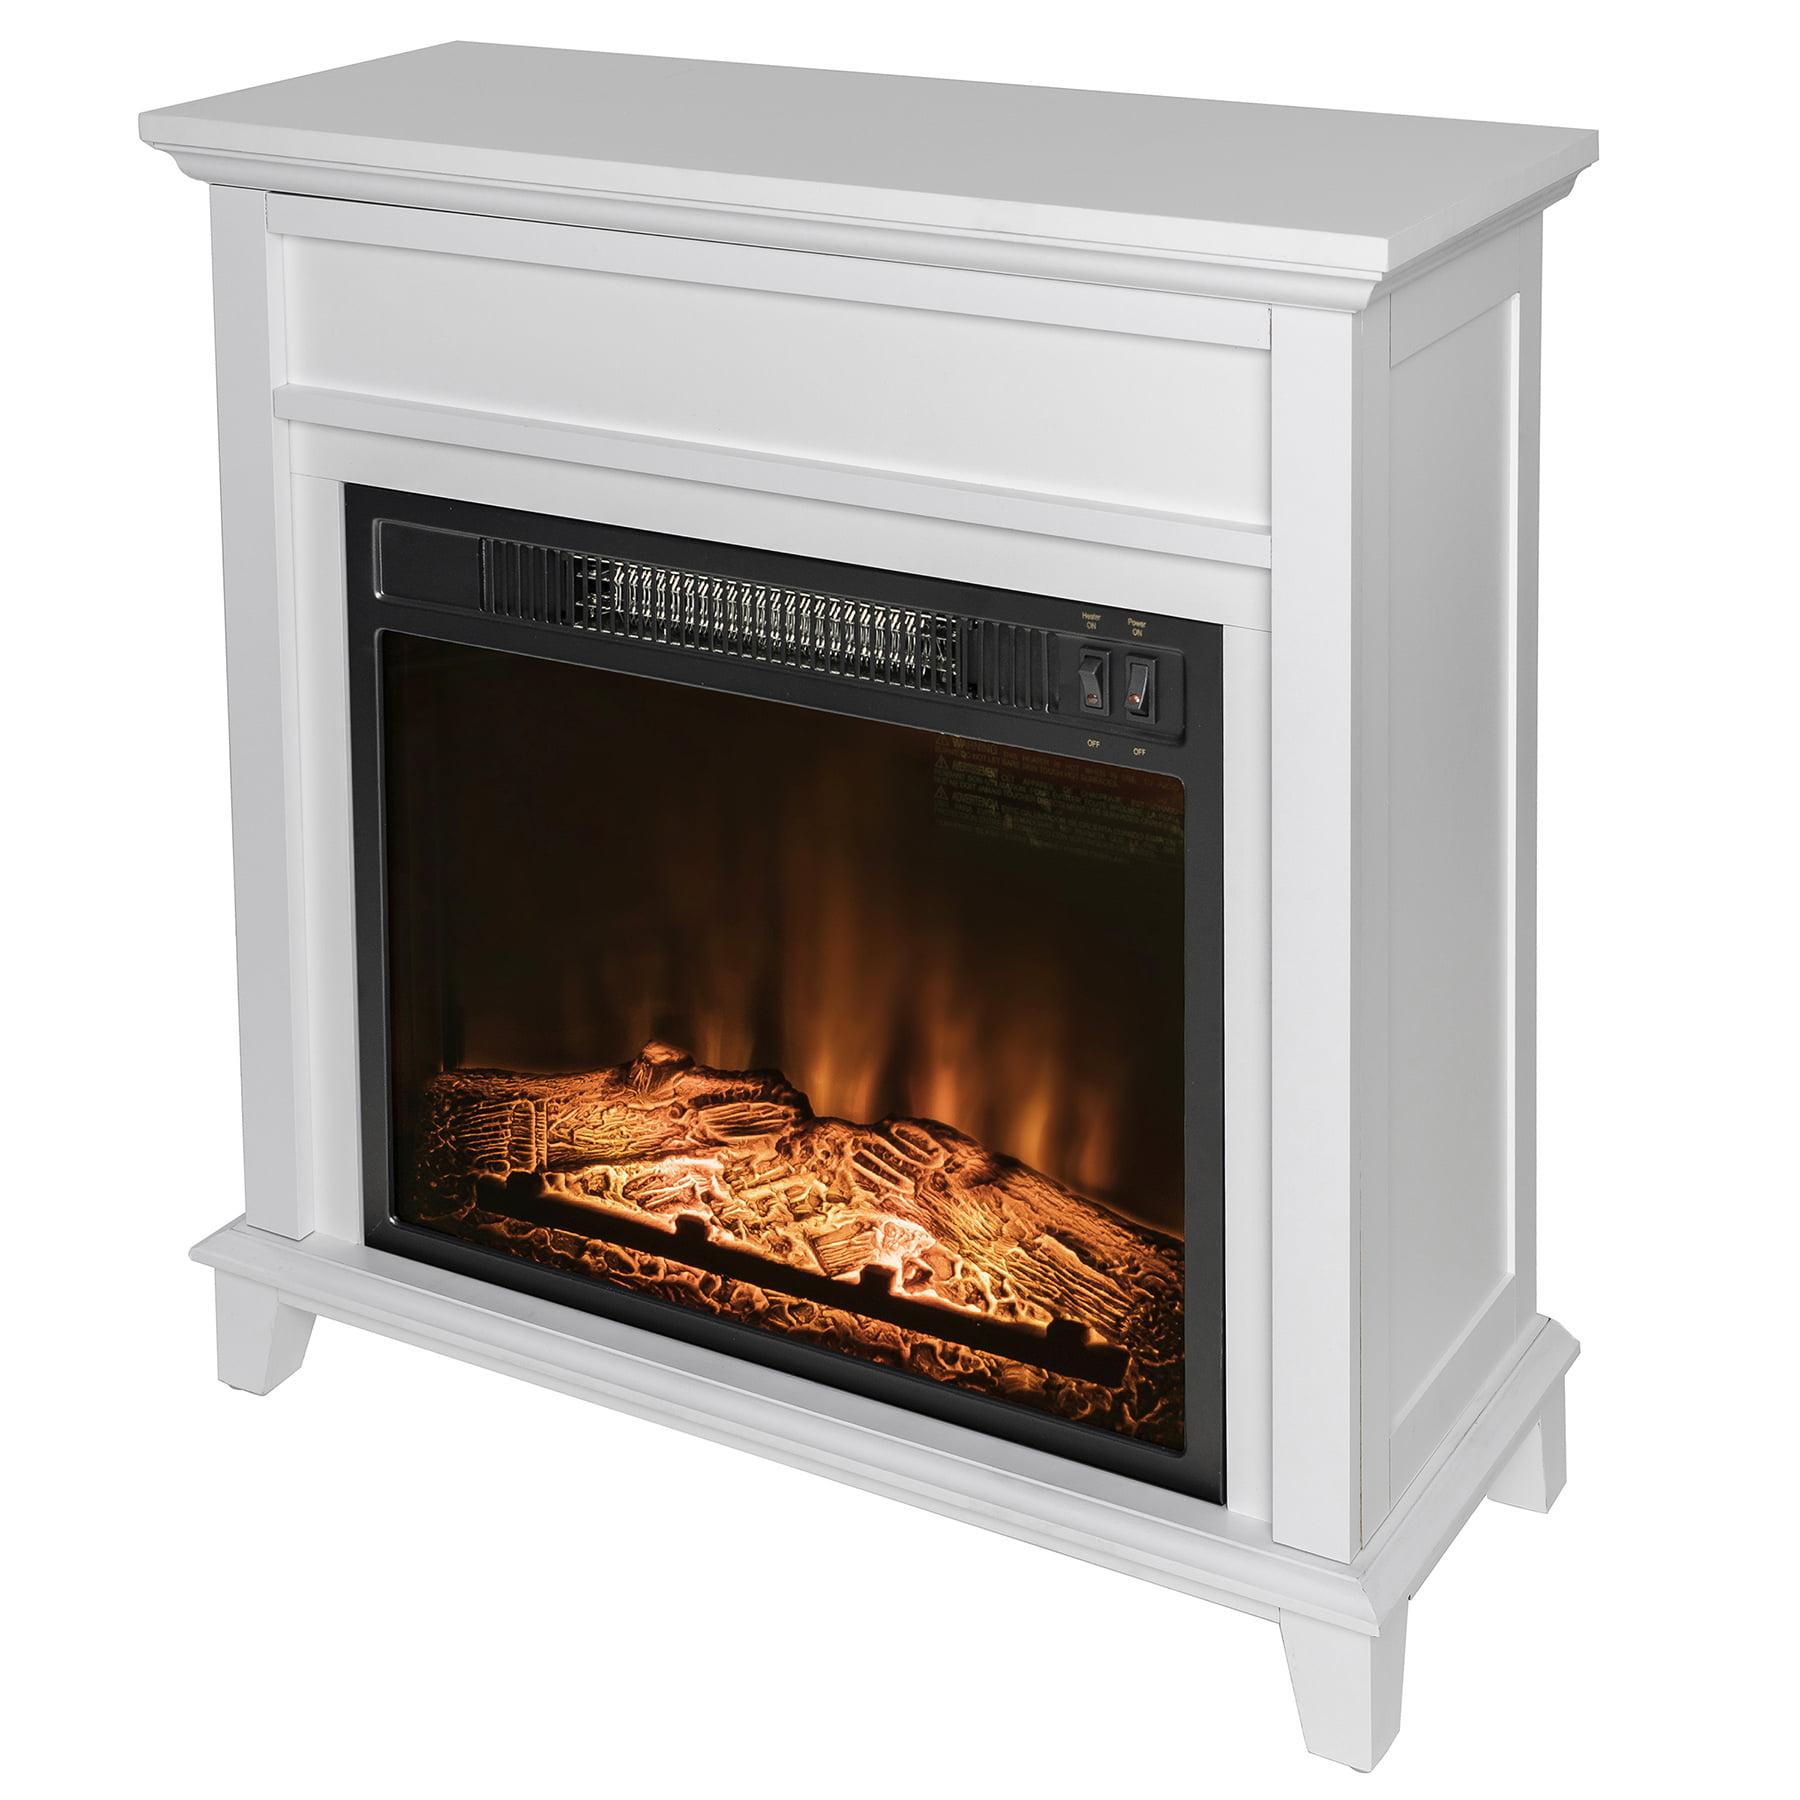 "AKDY FP0094 27"" Electric Fireplace Freestanding White Wooden Mantel Firebox Heater 3D... by AKDY"